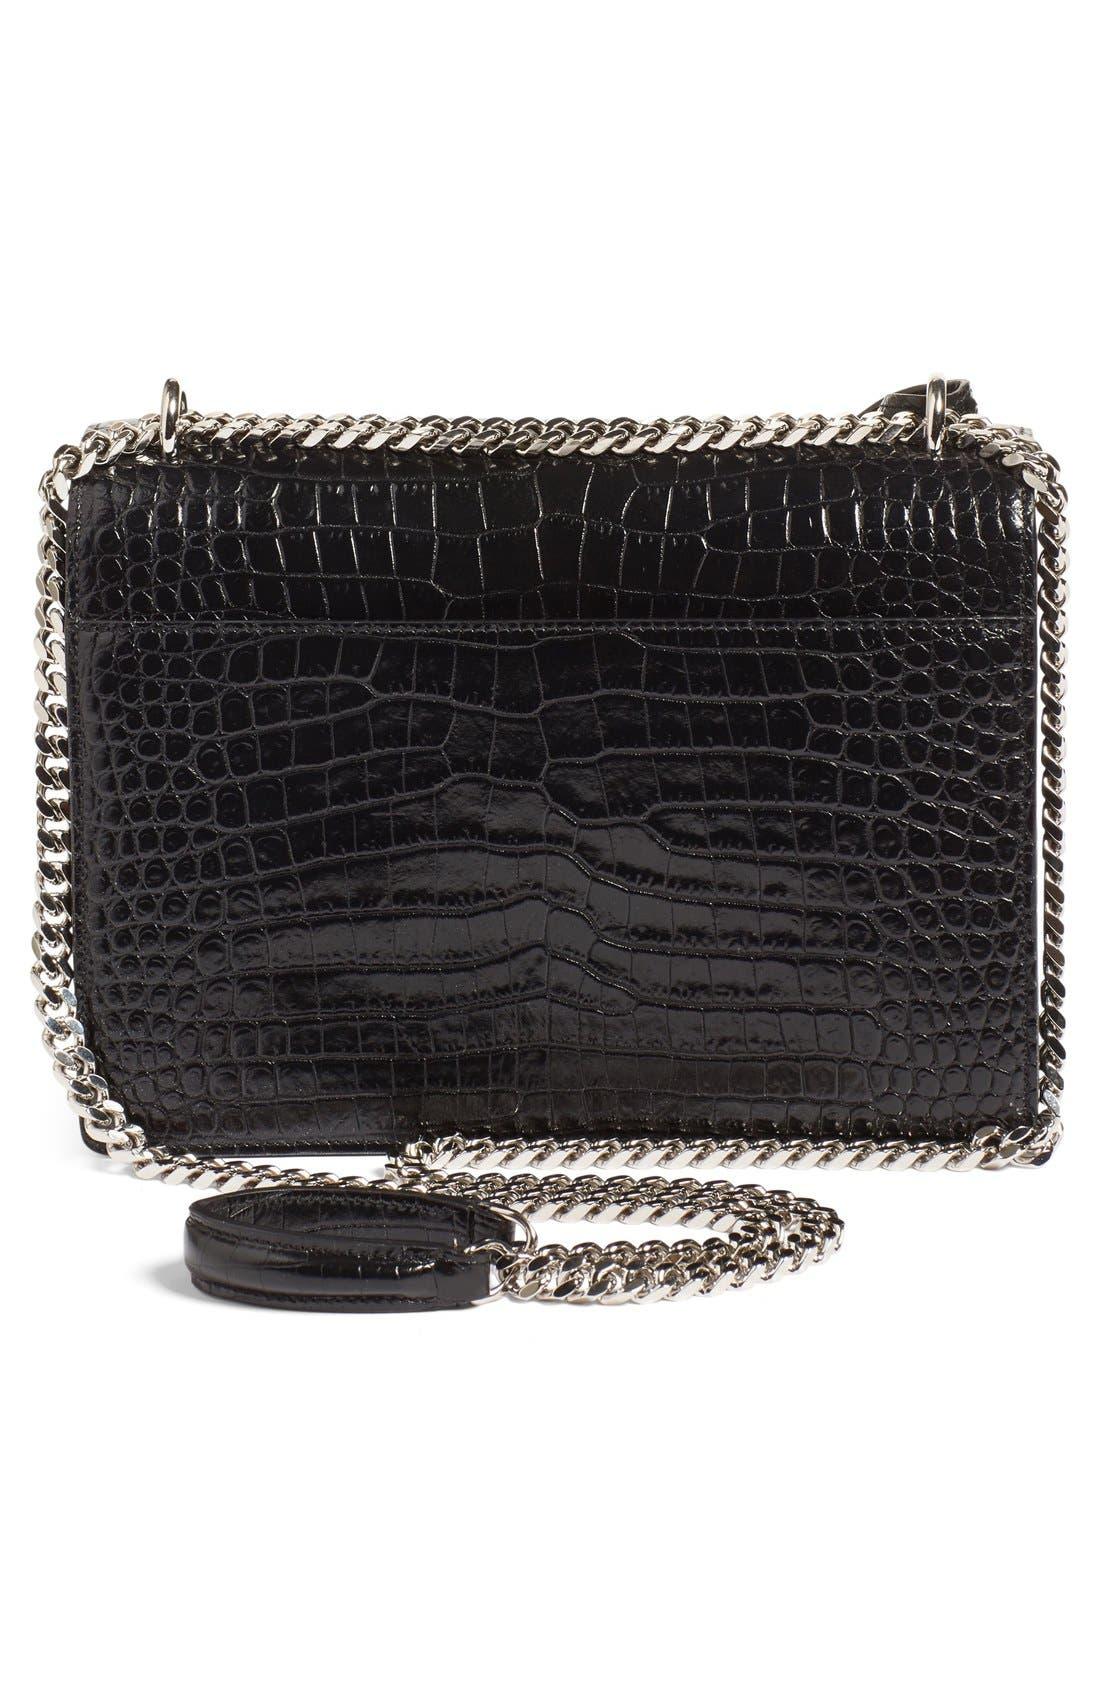 'Medium Monogram Sunset' Croc Embossed Leather Shoulder Bag,                             Alternate thumbnail 3, color,                             Nero